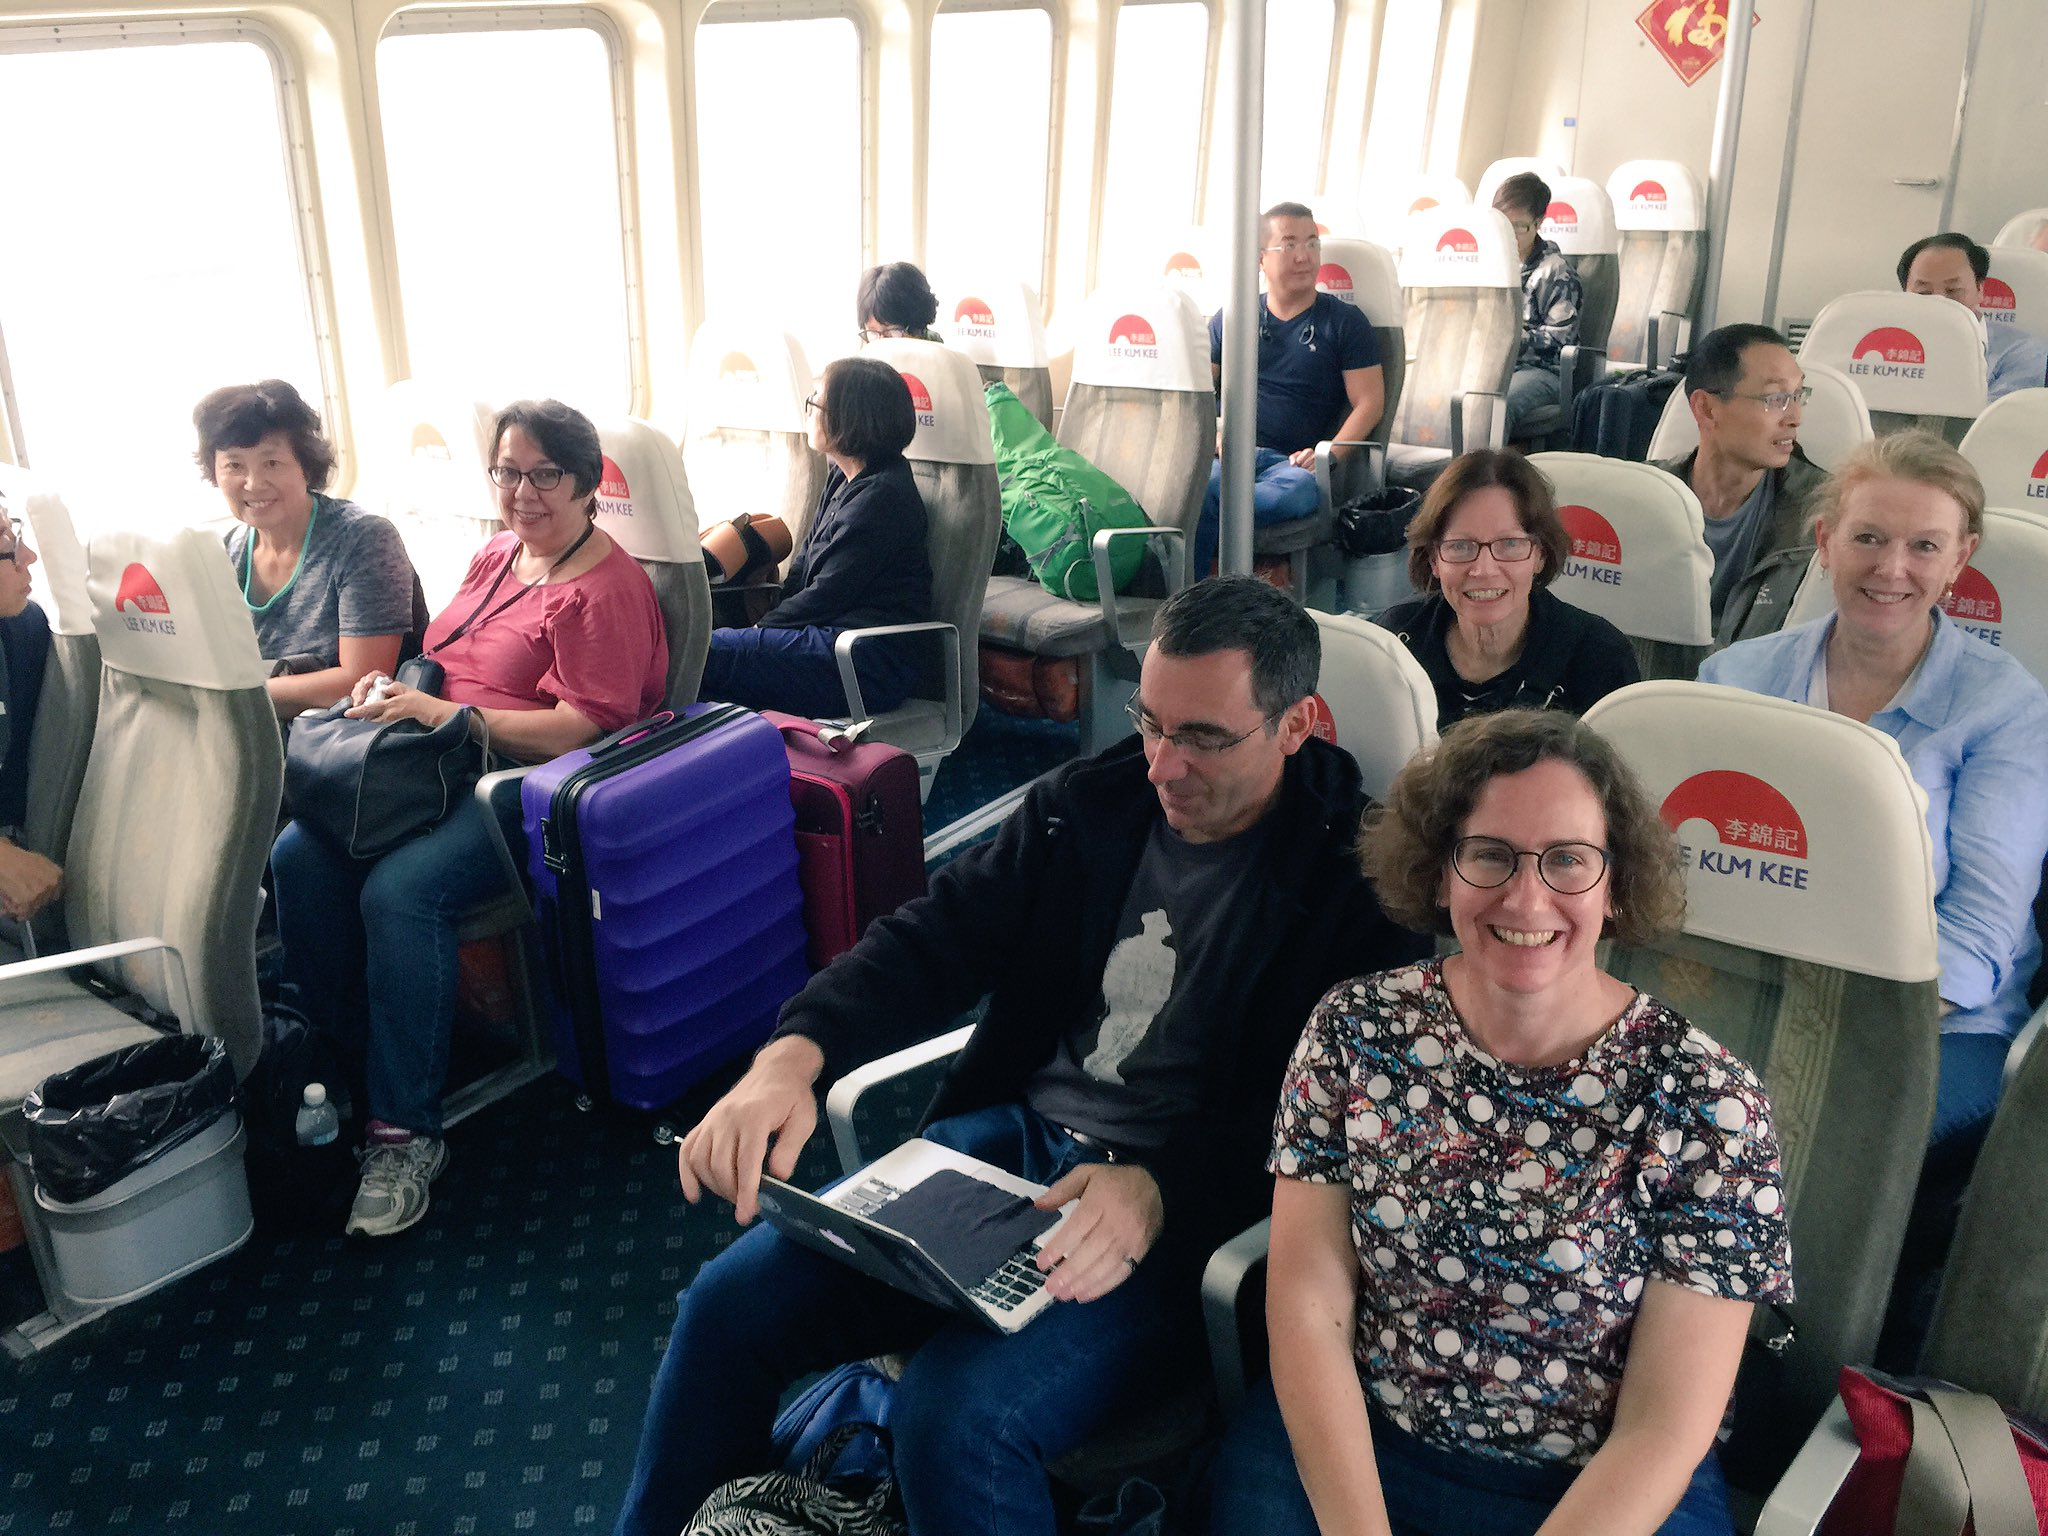 On the boat to Jiangmen. #cahht17 https://t.co/AQQBQAqgum